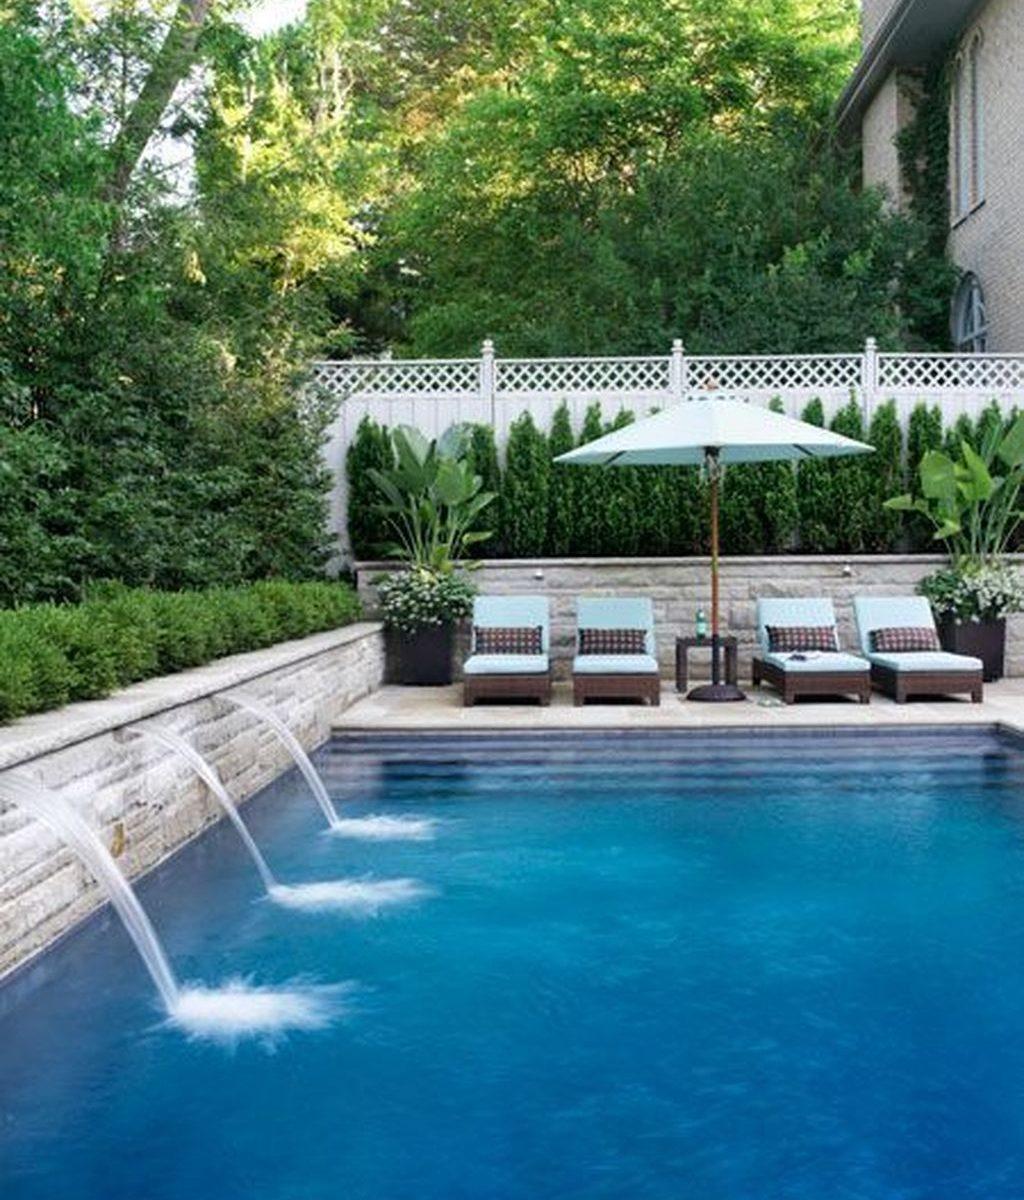 Fabulous Backyard Pool Landscaping Ideas You Never Seen Before 07